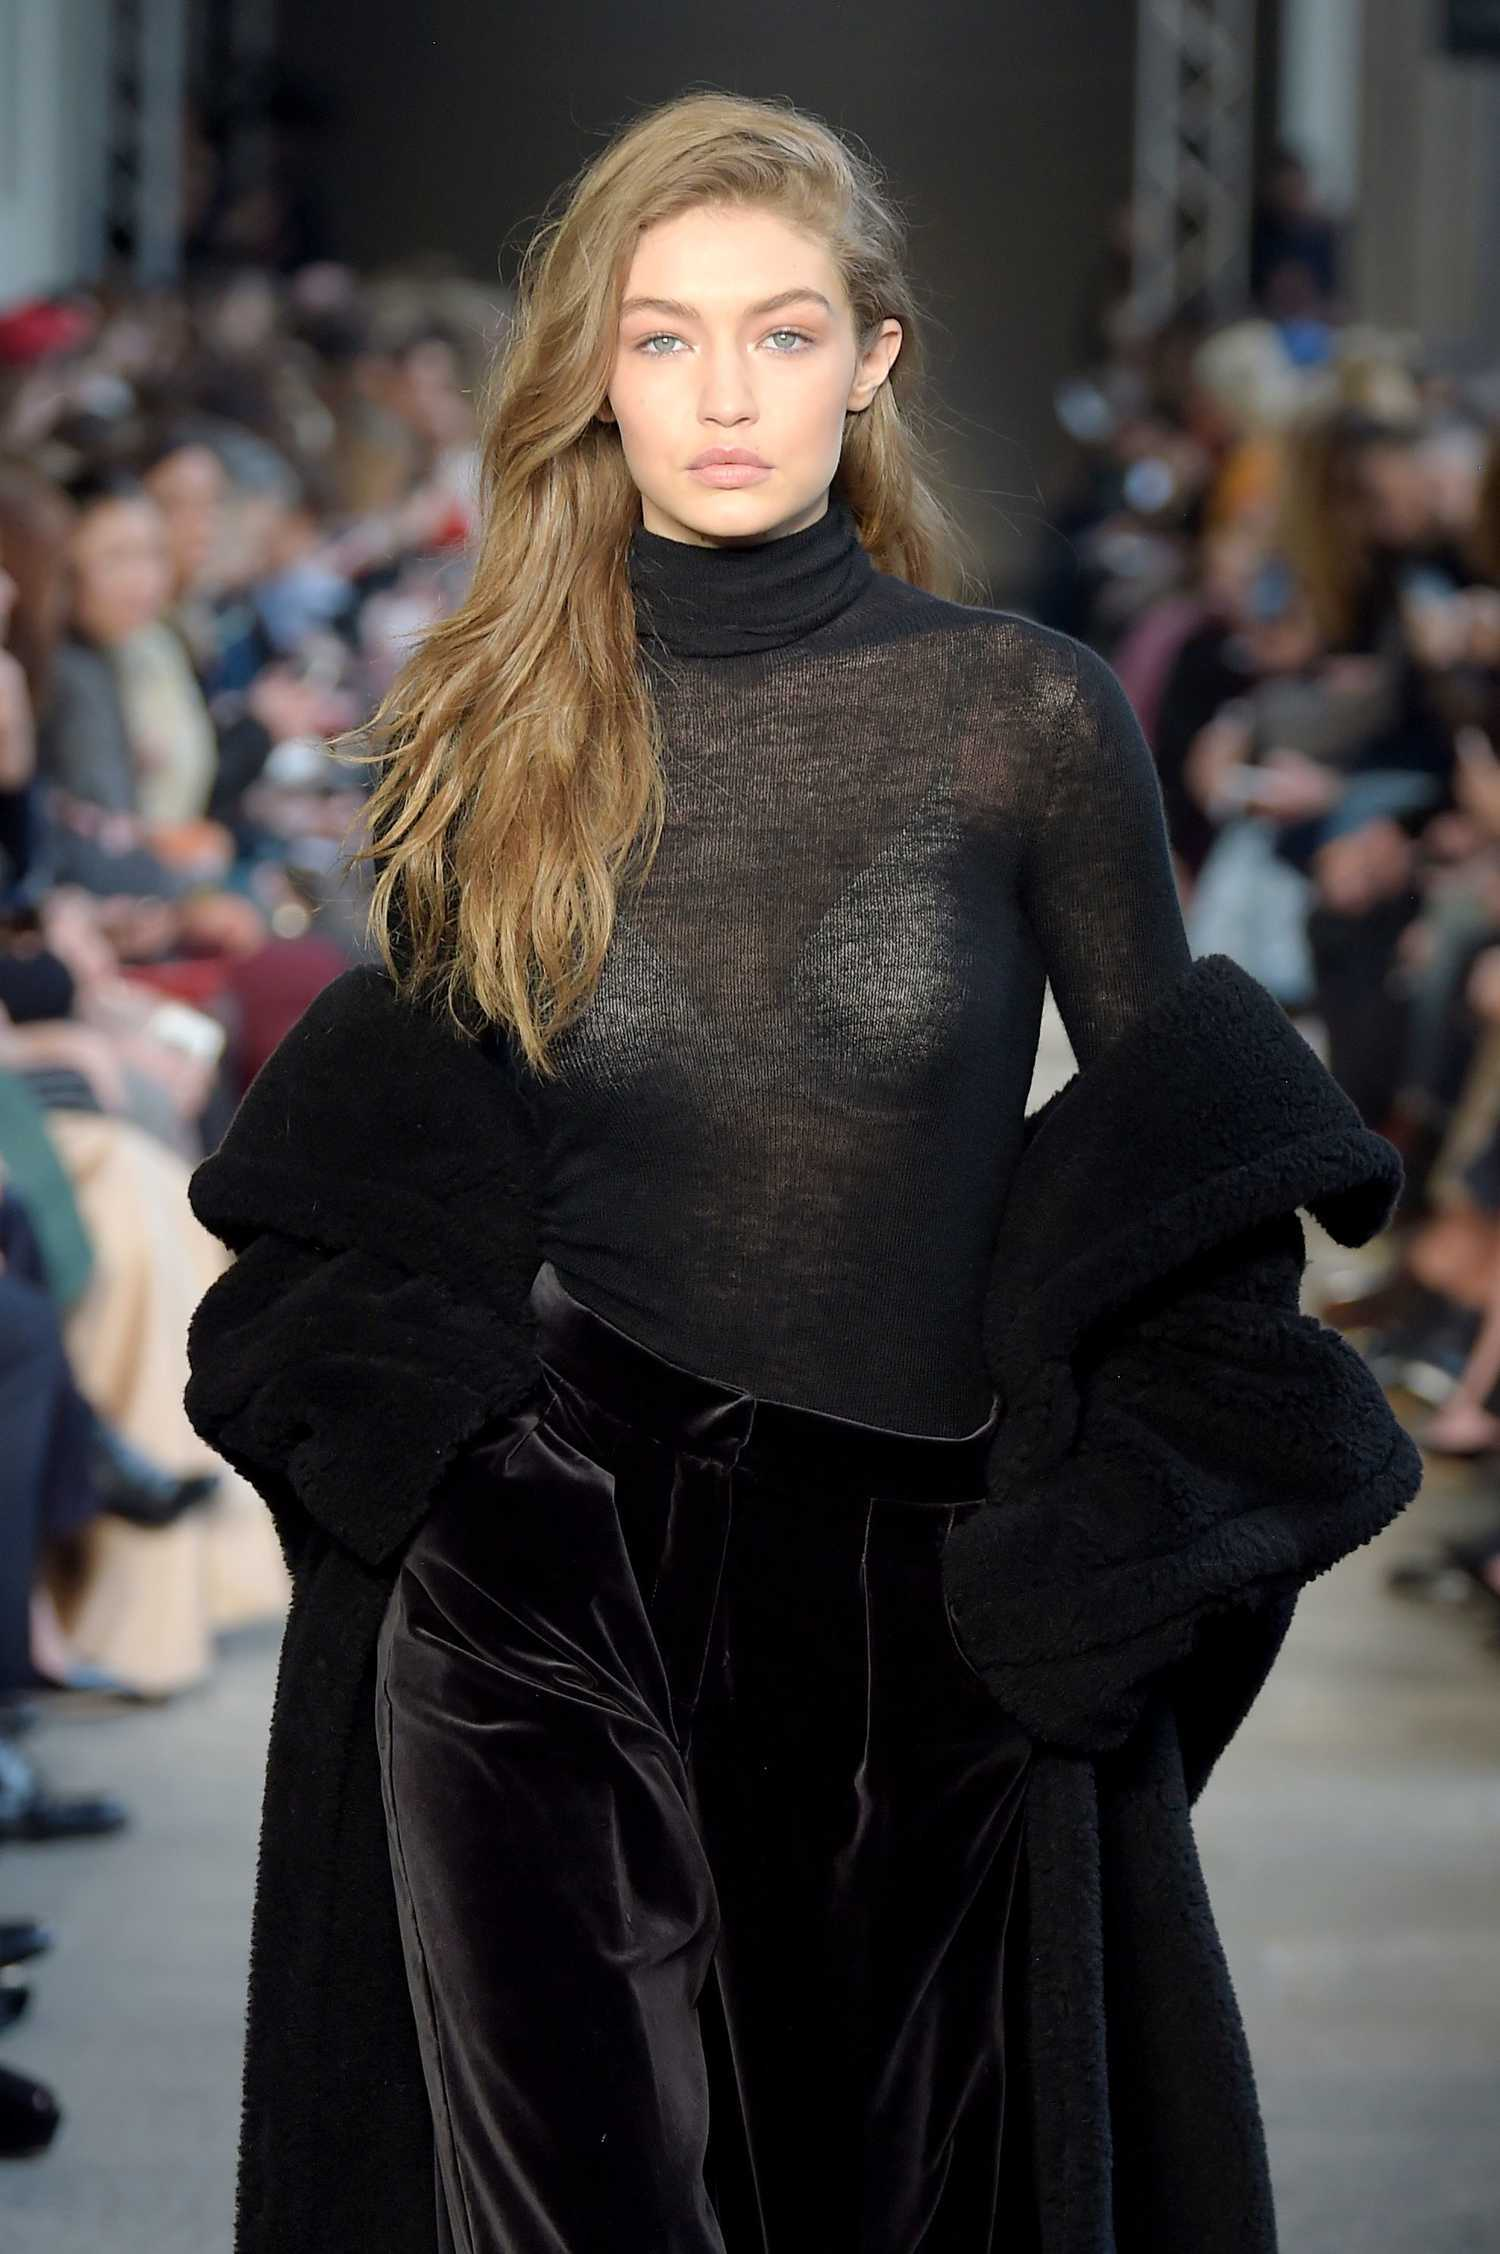 Gigi hadid at the max mara show during the milan fashion for Gigi hadid fashion week